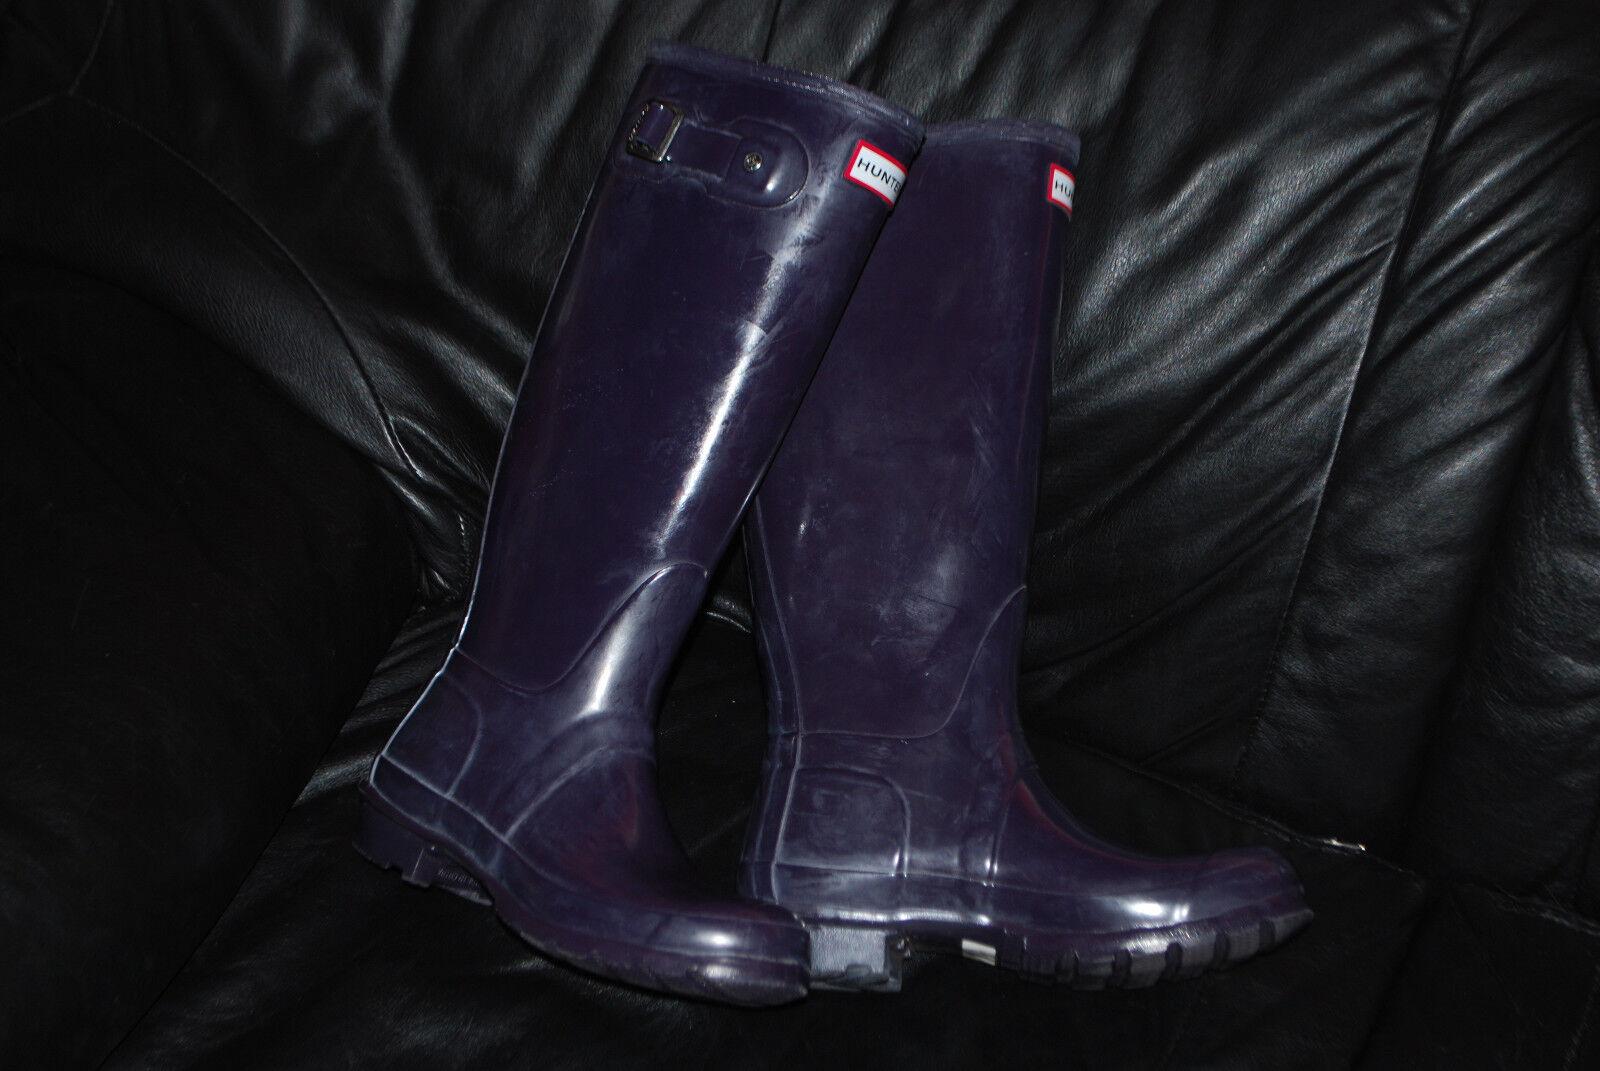 Para mujer púrpura oscuro Ciruela de Hunter Alto Brillante botas de lluvia (6 de Ciruela EE. UU.) 62efa4